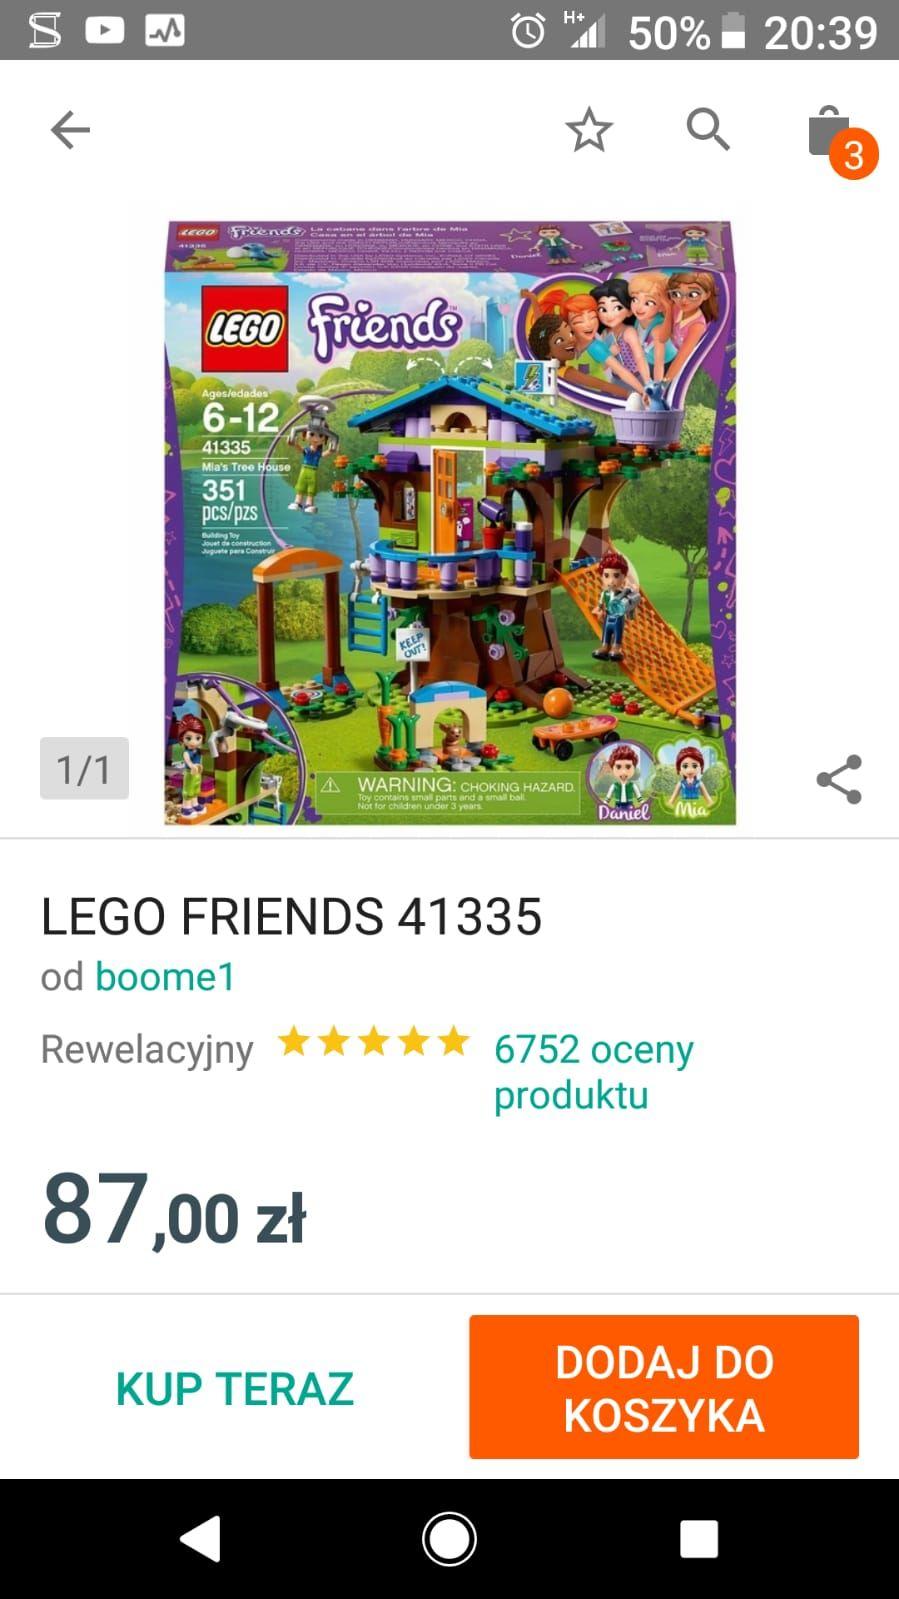 Lego friends 41335.